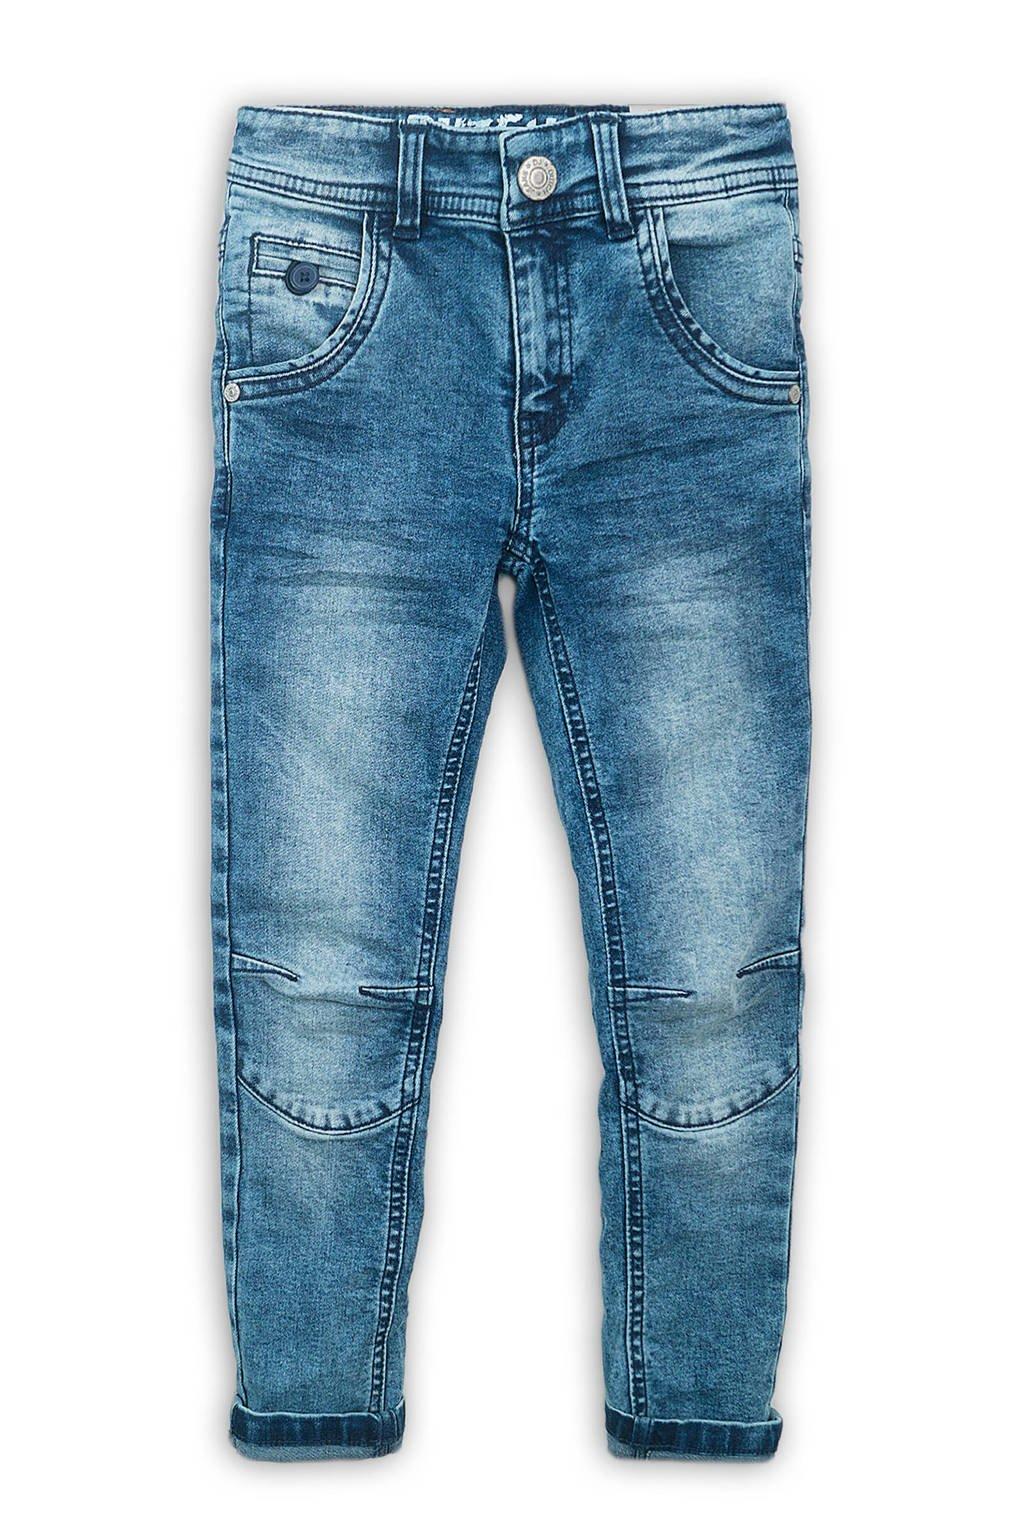 DJ Dutchjeans slim fit jeans stonewashed, Stonewashed